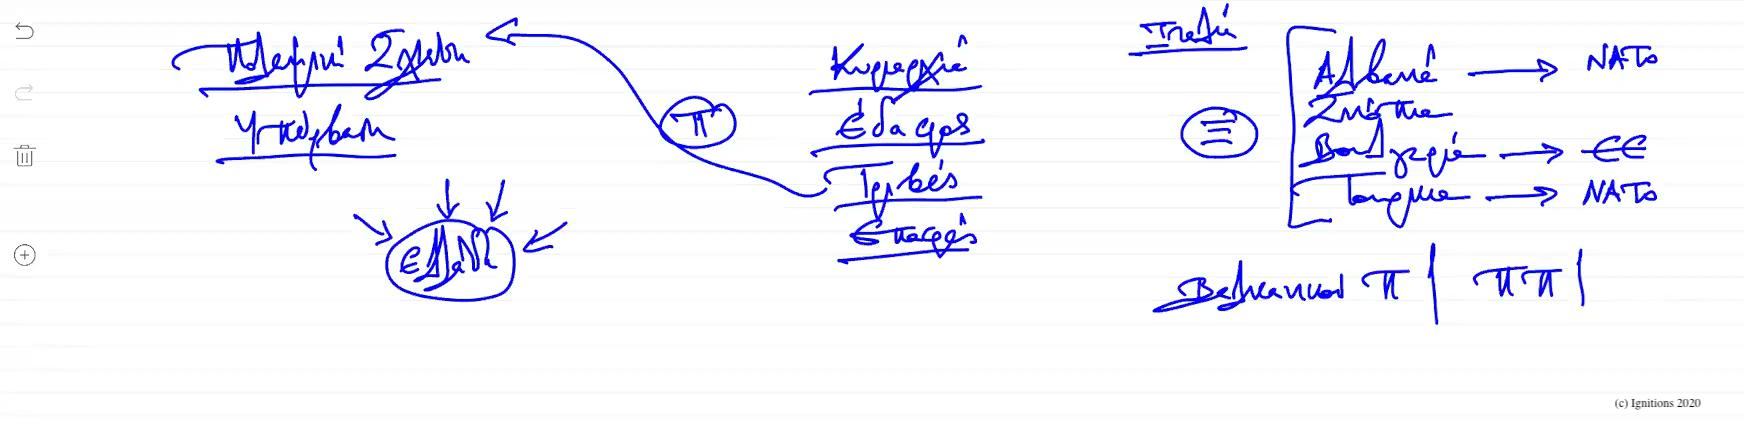 56021 - XI - e-Διάλεξη: Ελληνική Γεωστρατηγική I. (Dessin)